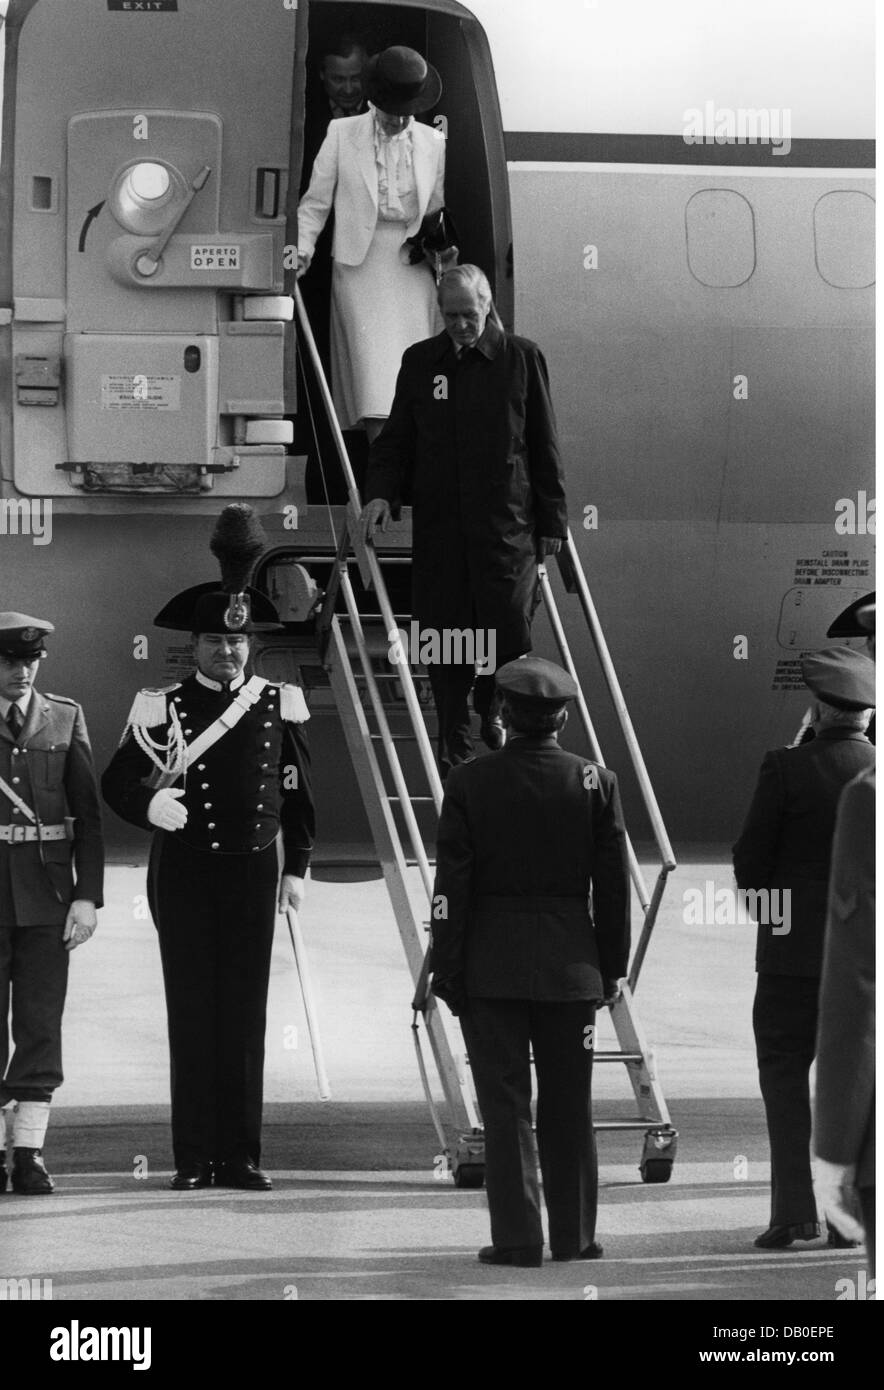 Carstens, Karl  14.12.1914 - 30.5.1992, German politician (CDU), president 1.7.1979 - 30.6.1984, half length, with - Stock Image